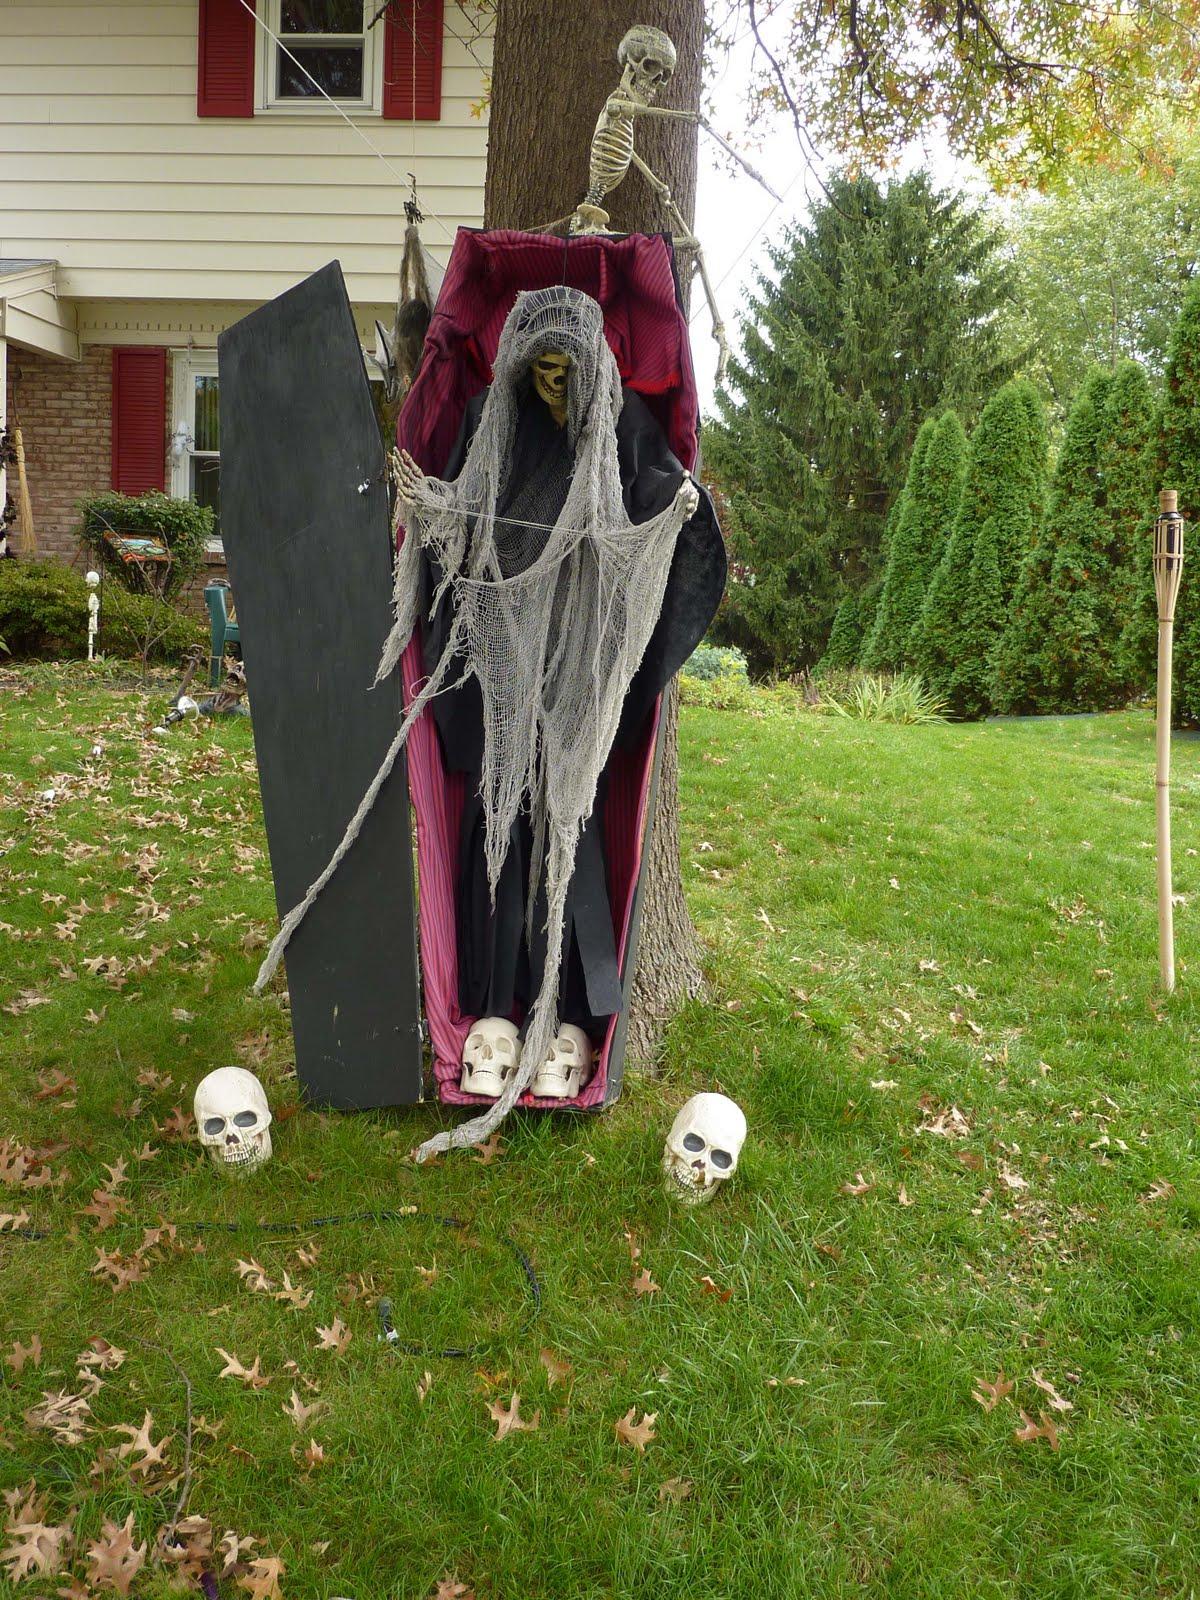 Atades artesanales  decoracin halloween